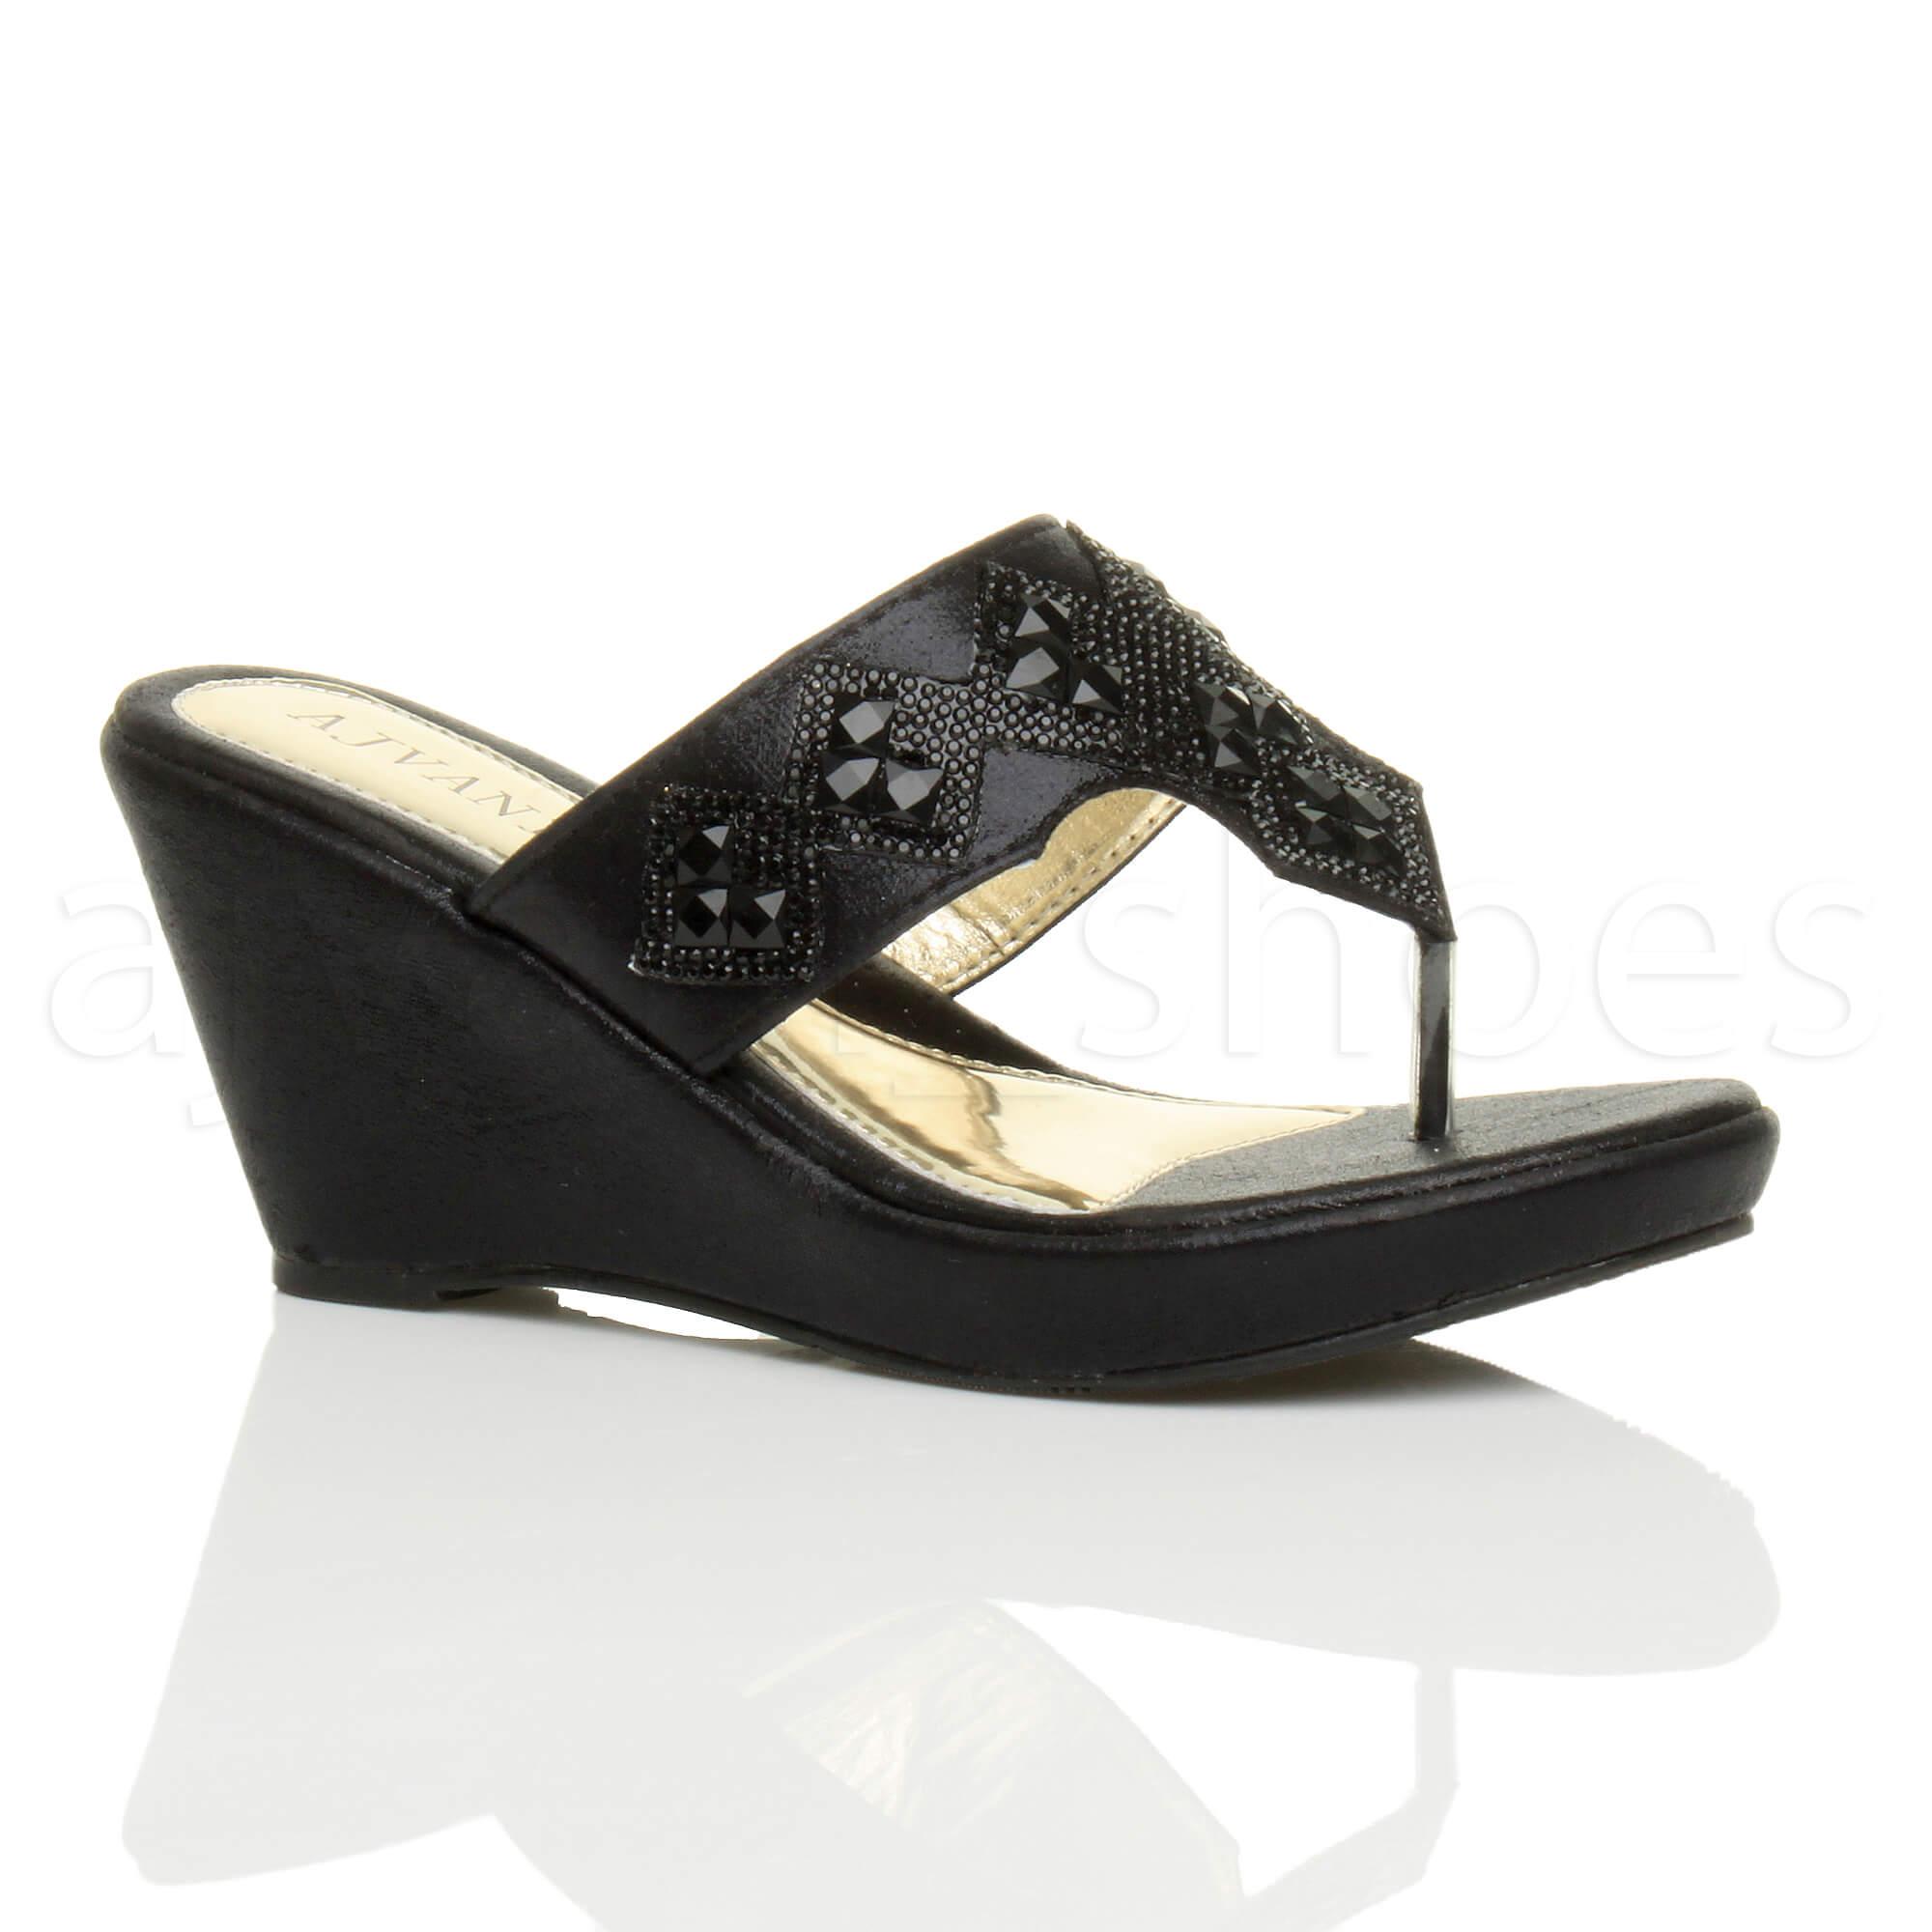 Womens Ladies High Wedge Heel Platform Toe Post Diamante Sandals Shoes